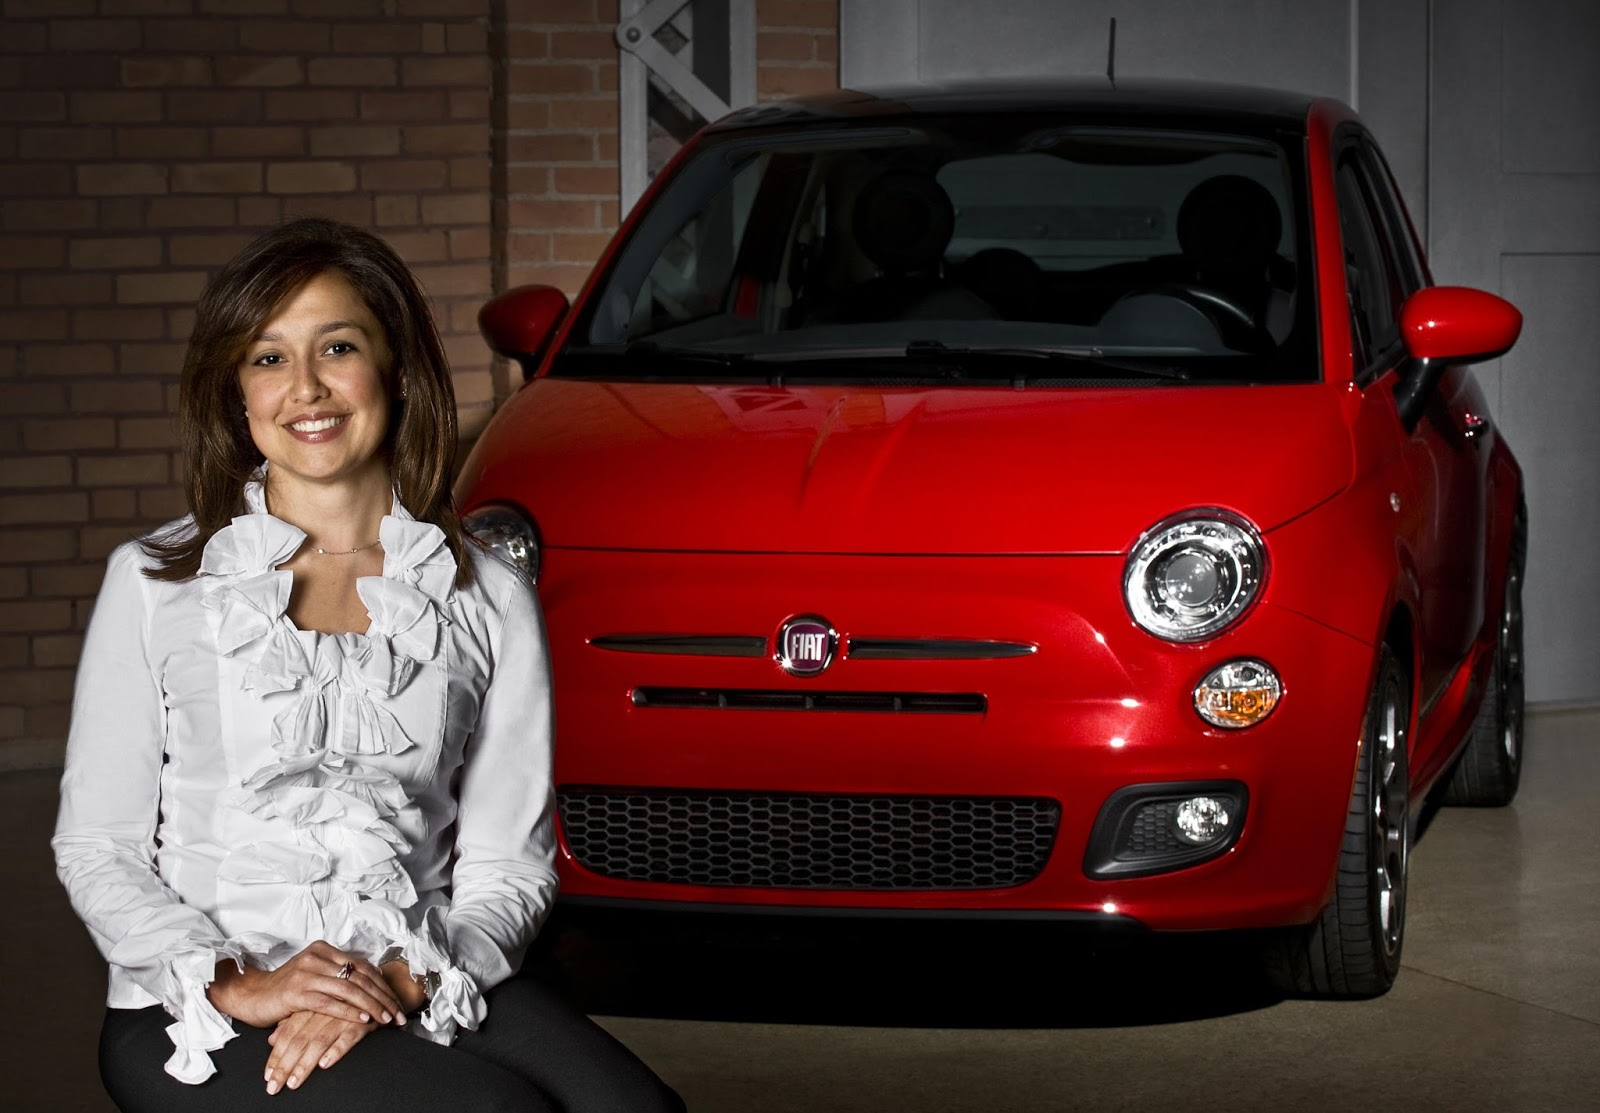 To Fiat 500 λέει ένα μεγάλο ευχαριστώ σε όλες τις γυναίκες